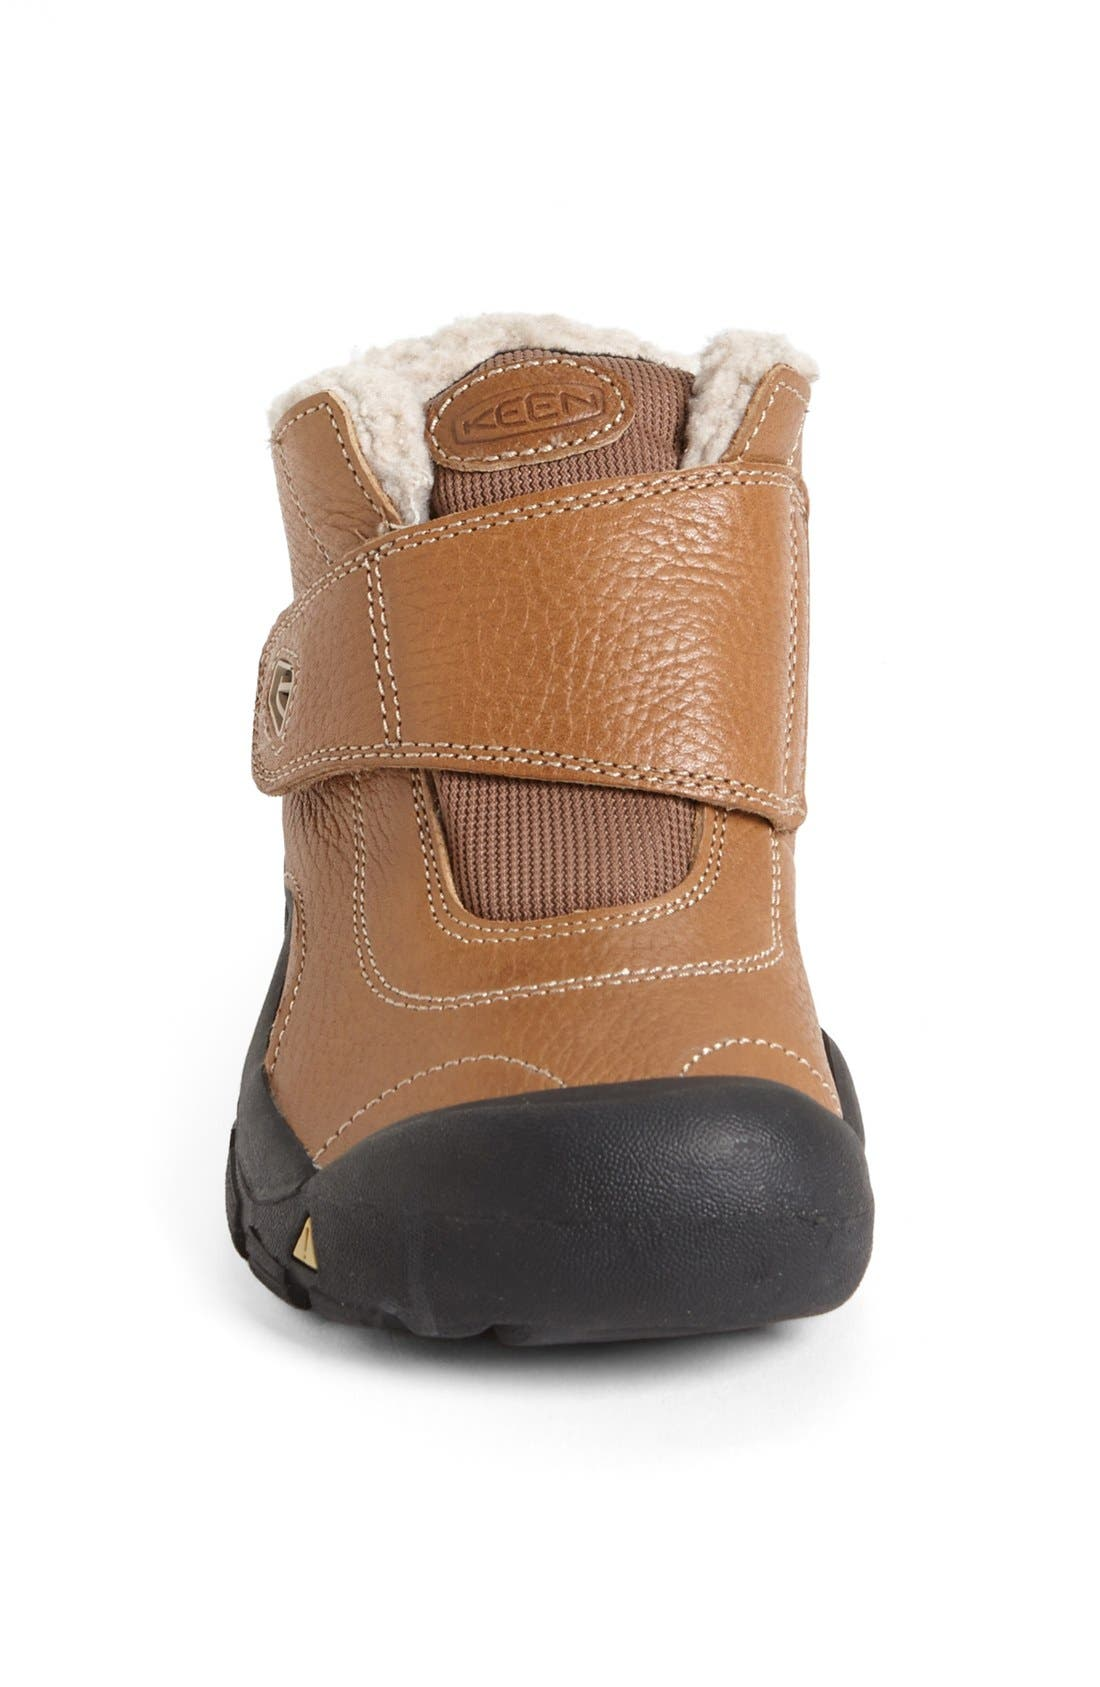 'Kootenay' Boot,                             Alternate thumbnail 5, color,                             PINECONE